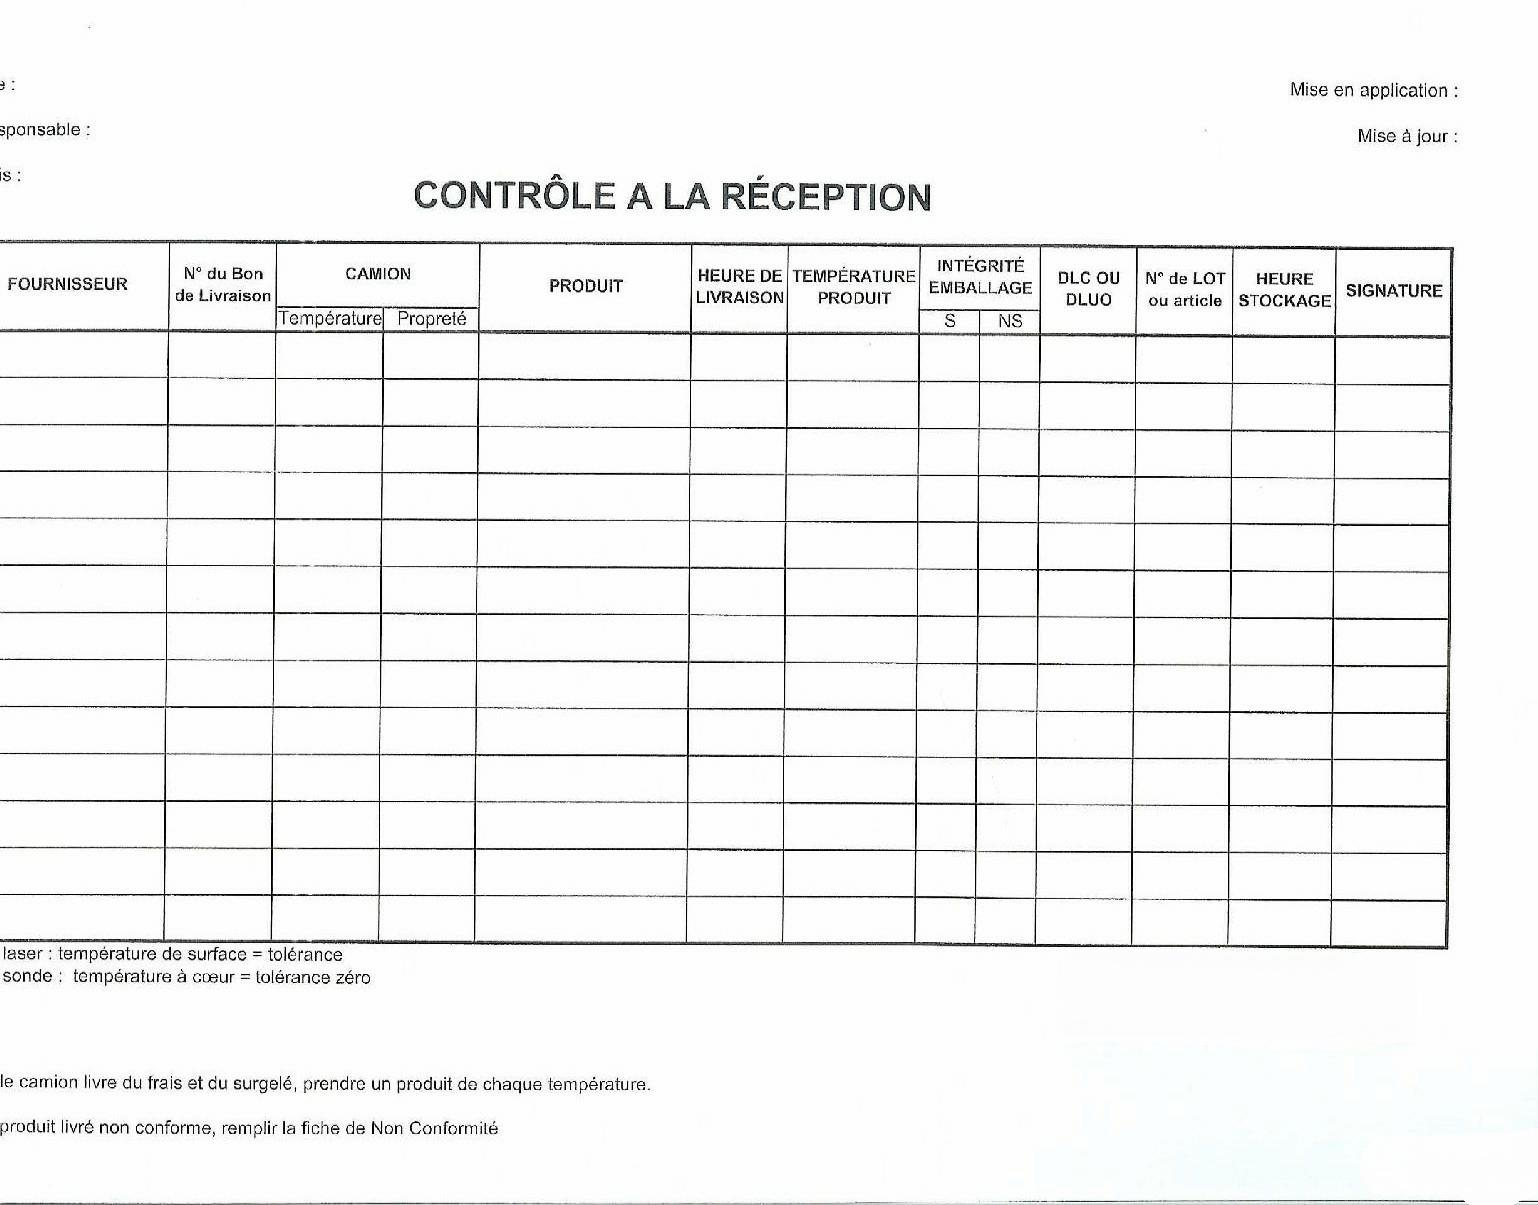 controle-a-la-reception-